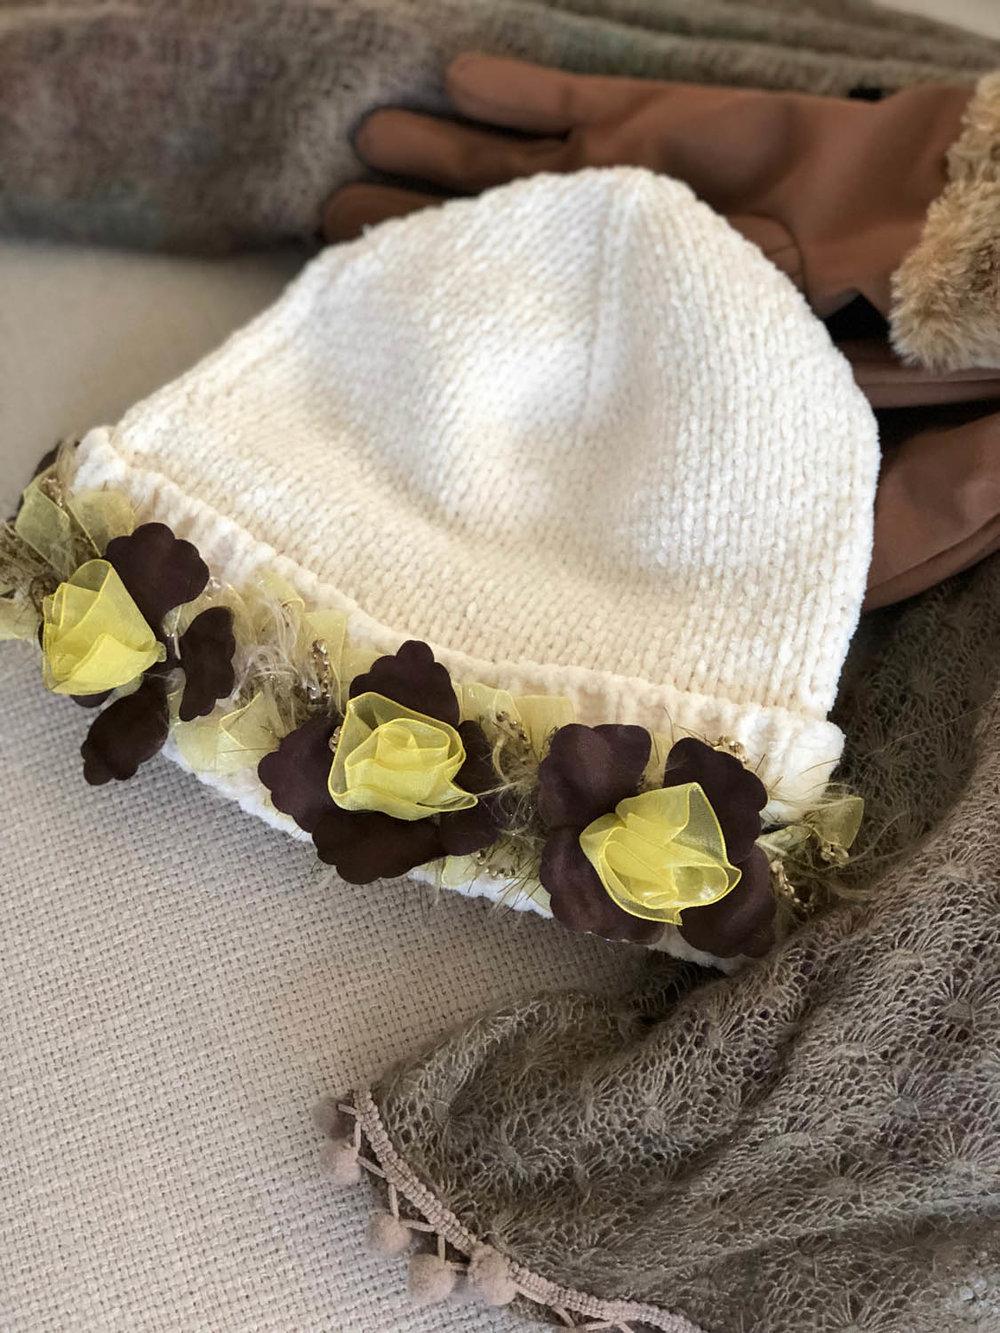 Elastic ribbon flower trim embellishing a purchased white chenille winter hat